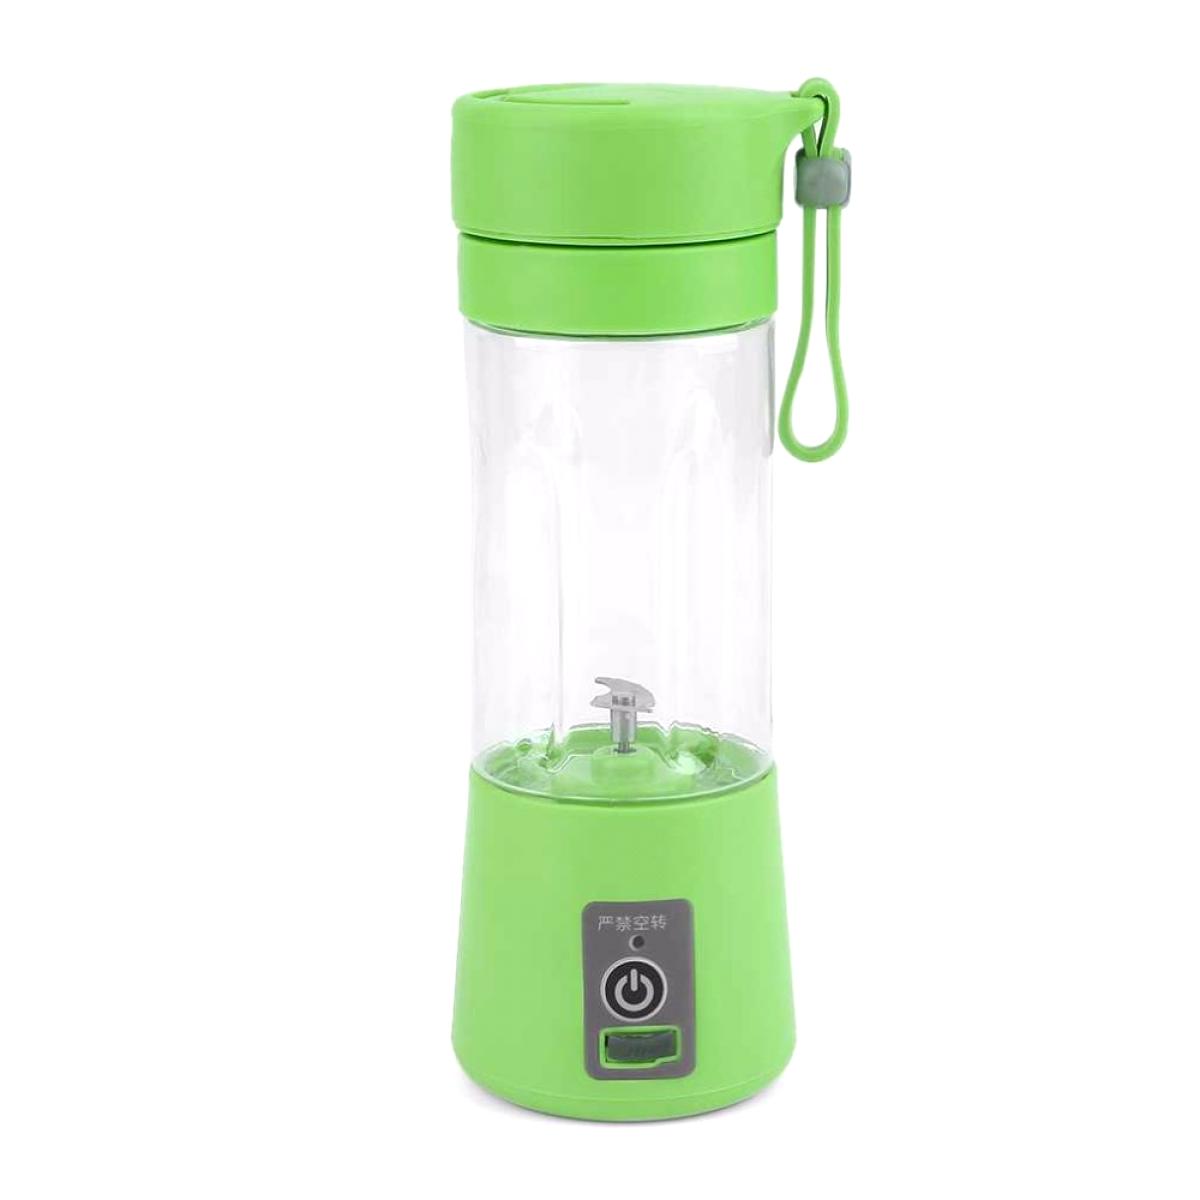 Small Electric Juicer ~ Electric fruit juicer cup mini blender portable usb juice